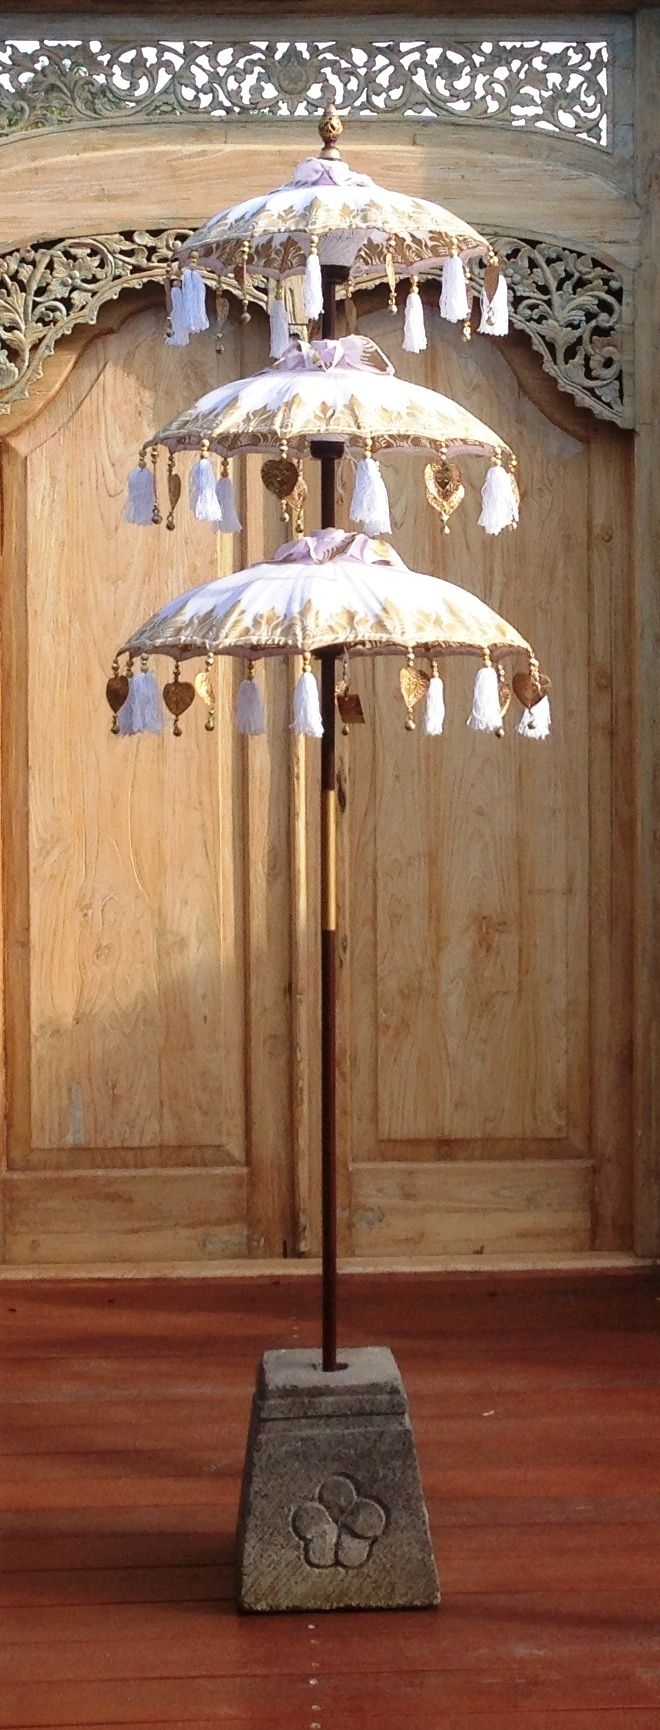 umbrellas bali mystique spirit of bali pinterest bali ombrelle et moucharabieh. Black Bedroom Furniture Sets. Home Design Ideas